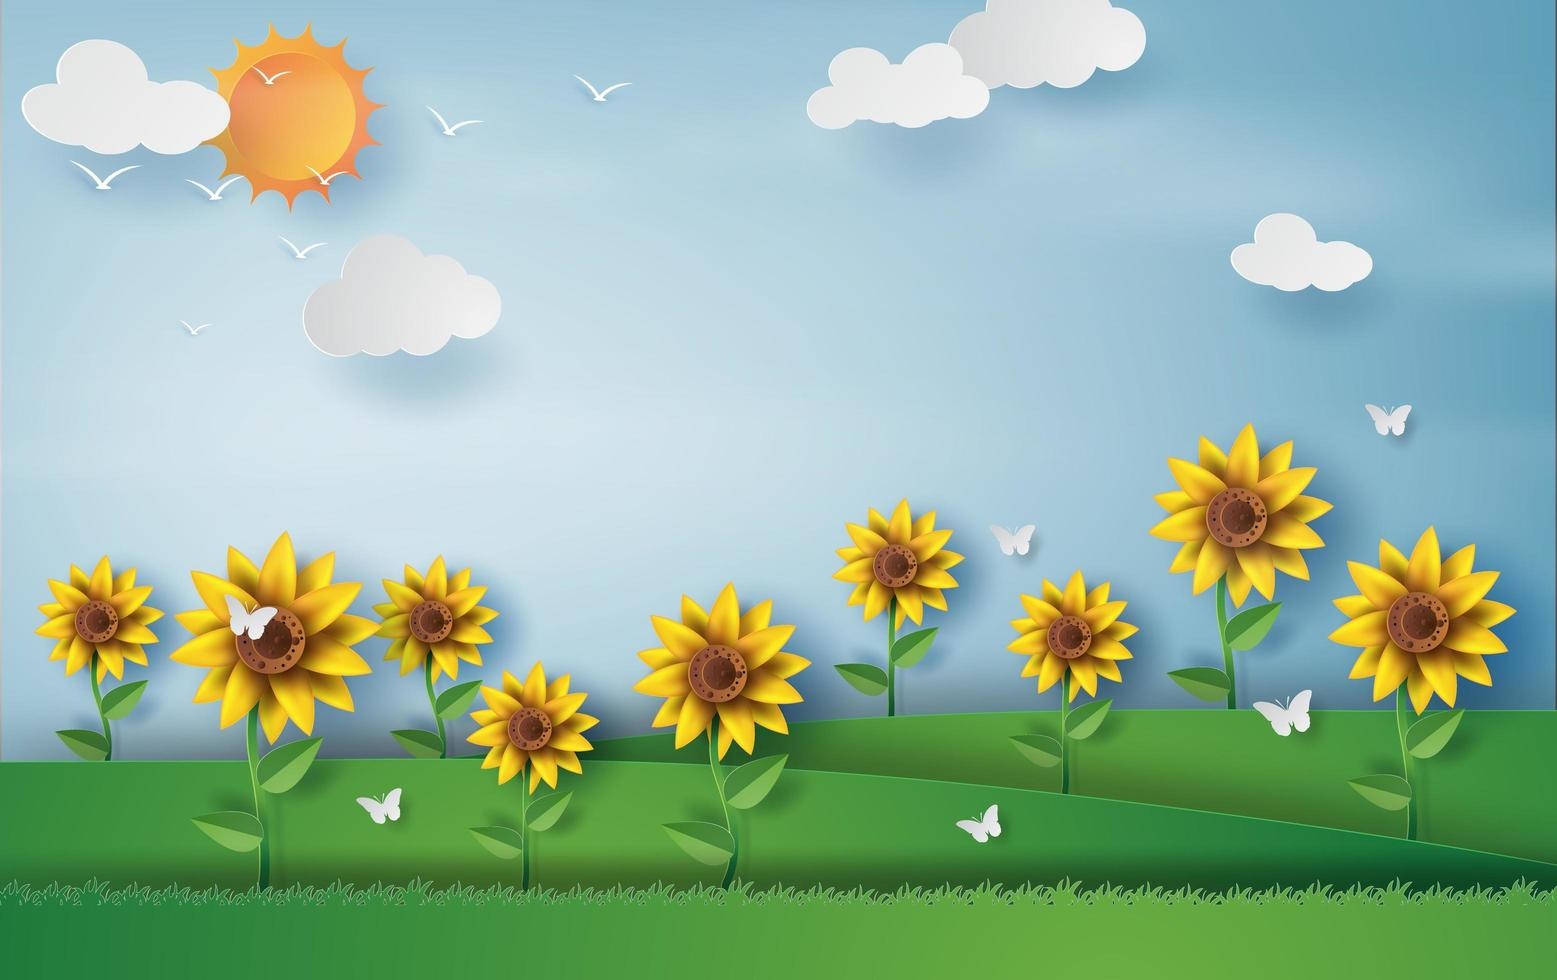 paisaje de campo de flor de girasol del fondo de banner de temporada de verano vector